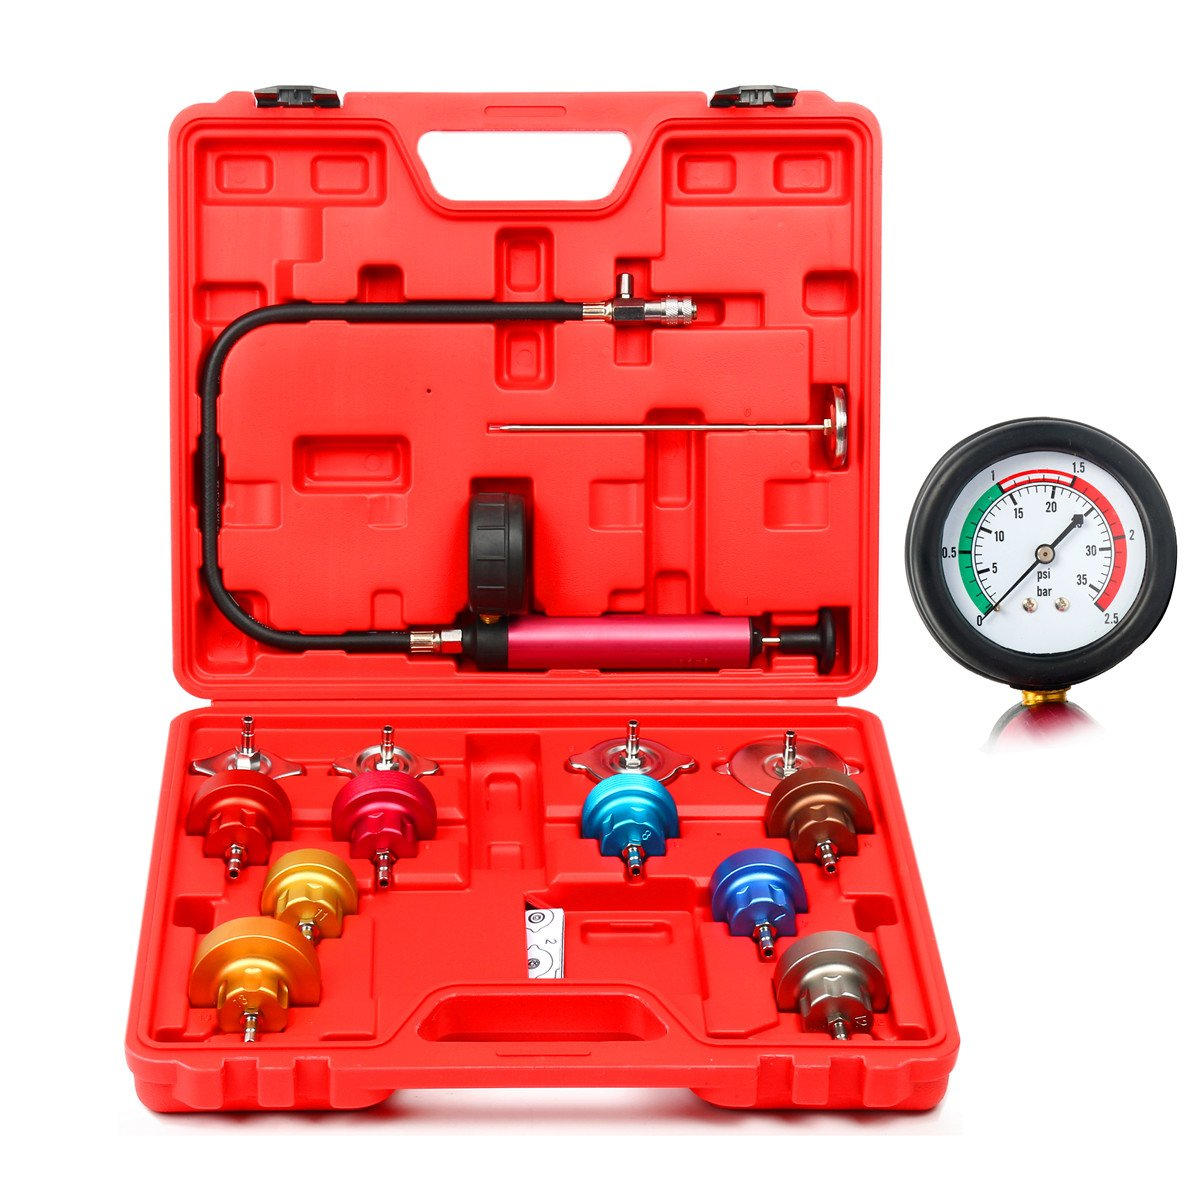 8MILELAKE 14pc Radiator Pump Pressure Leak Tester Kit Vacuum Pressure Cooling System Tester by 8MILELAKE (Image #9)